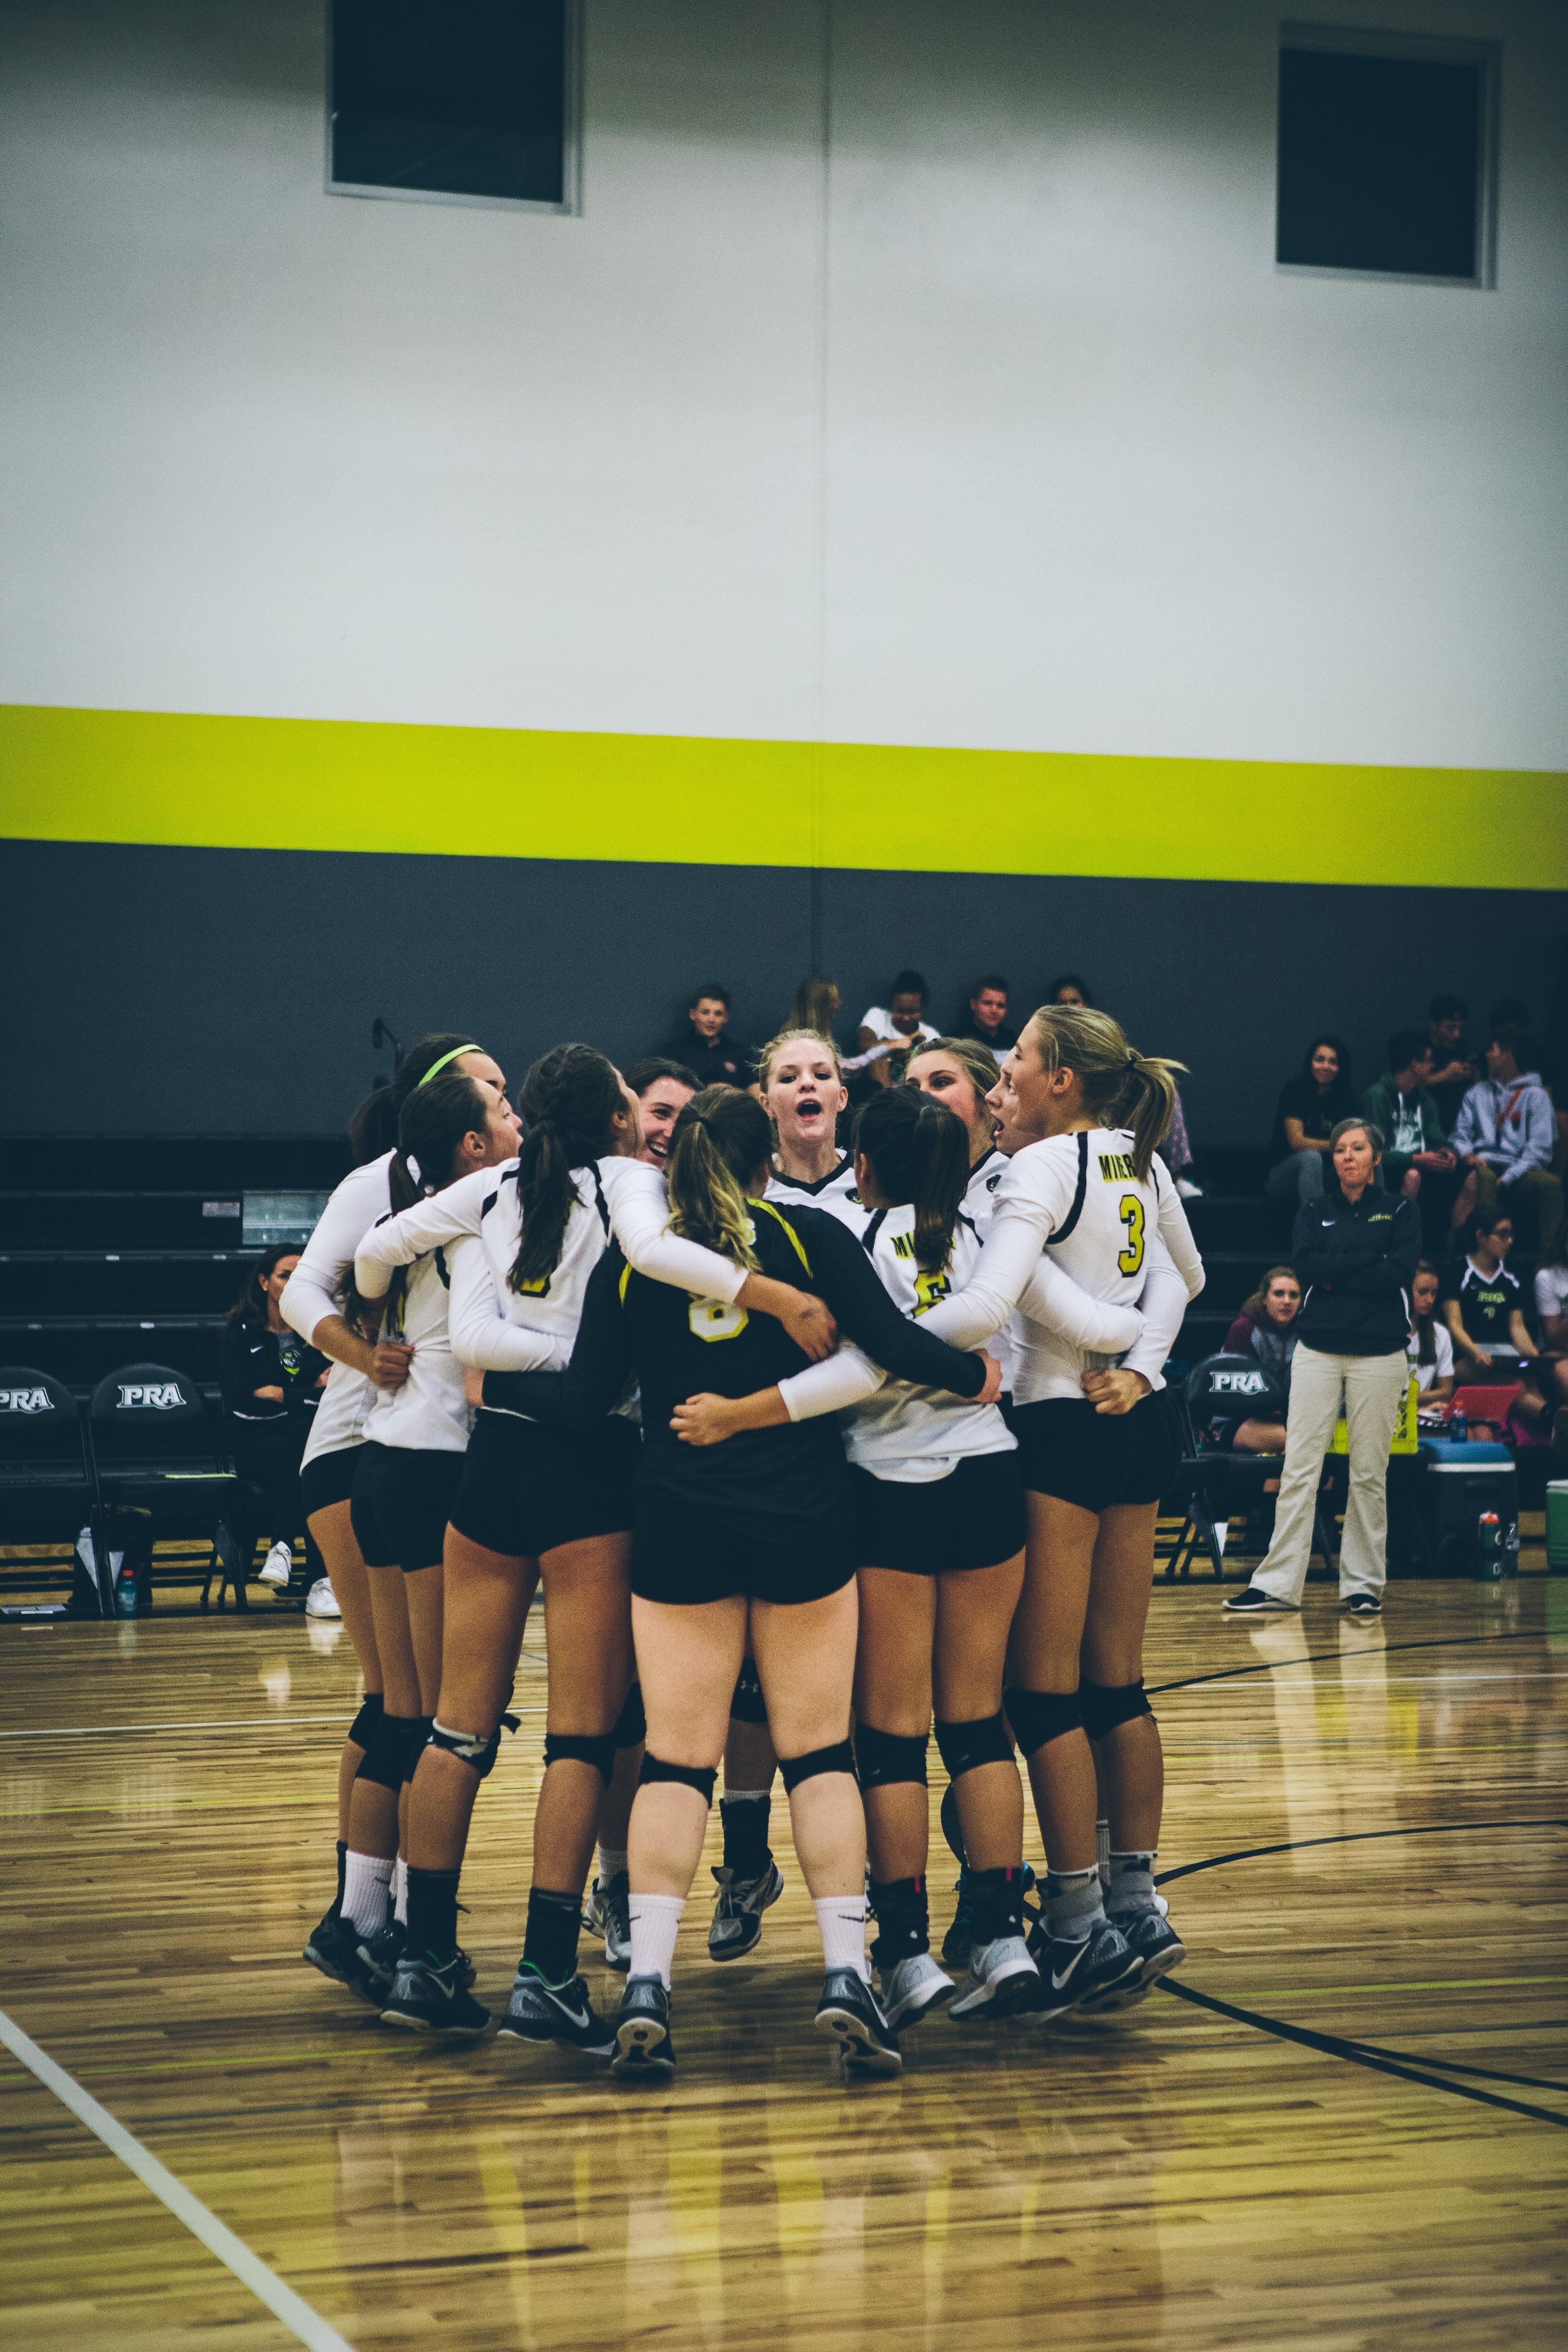 Volleyball team huddle